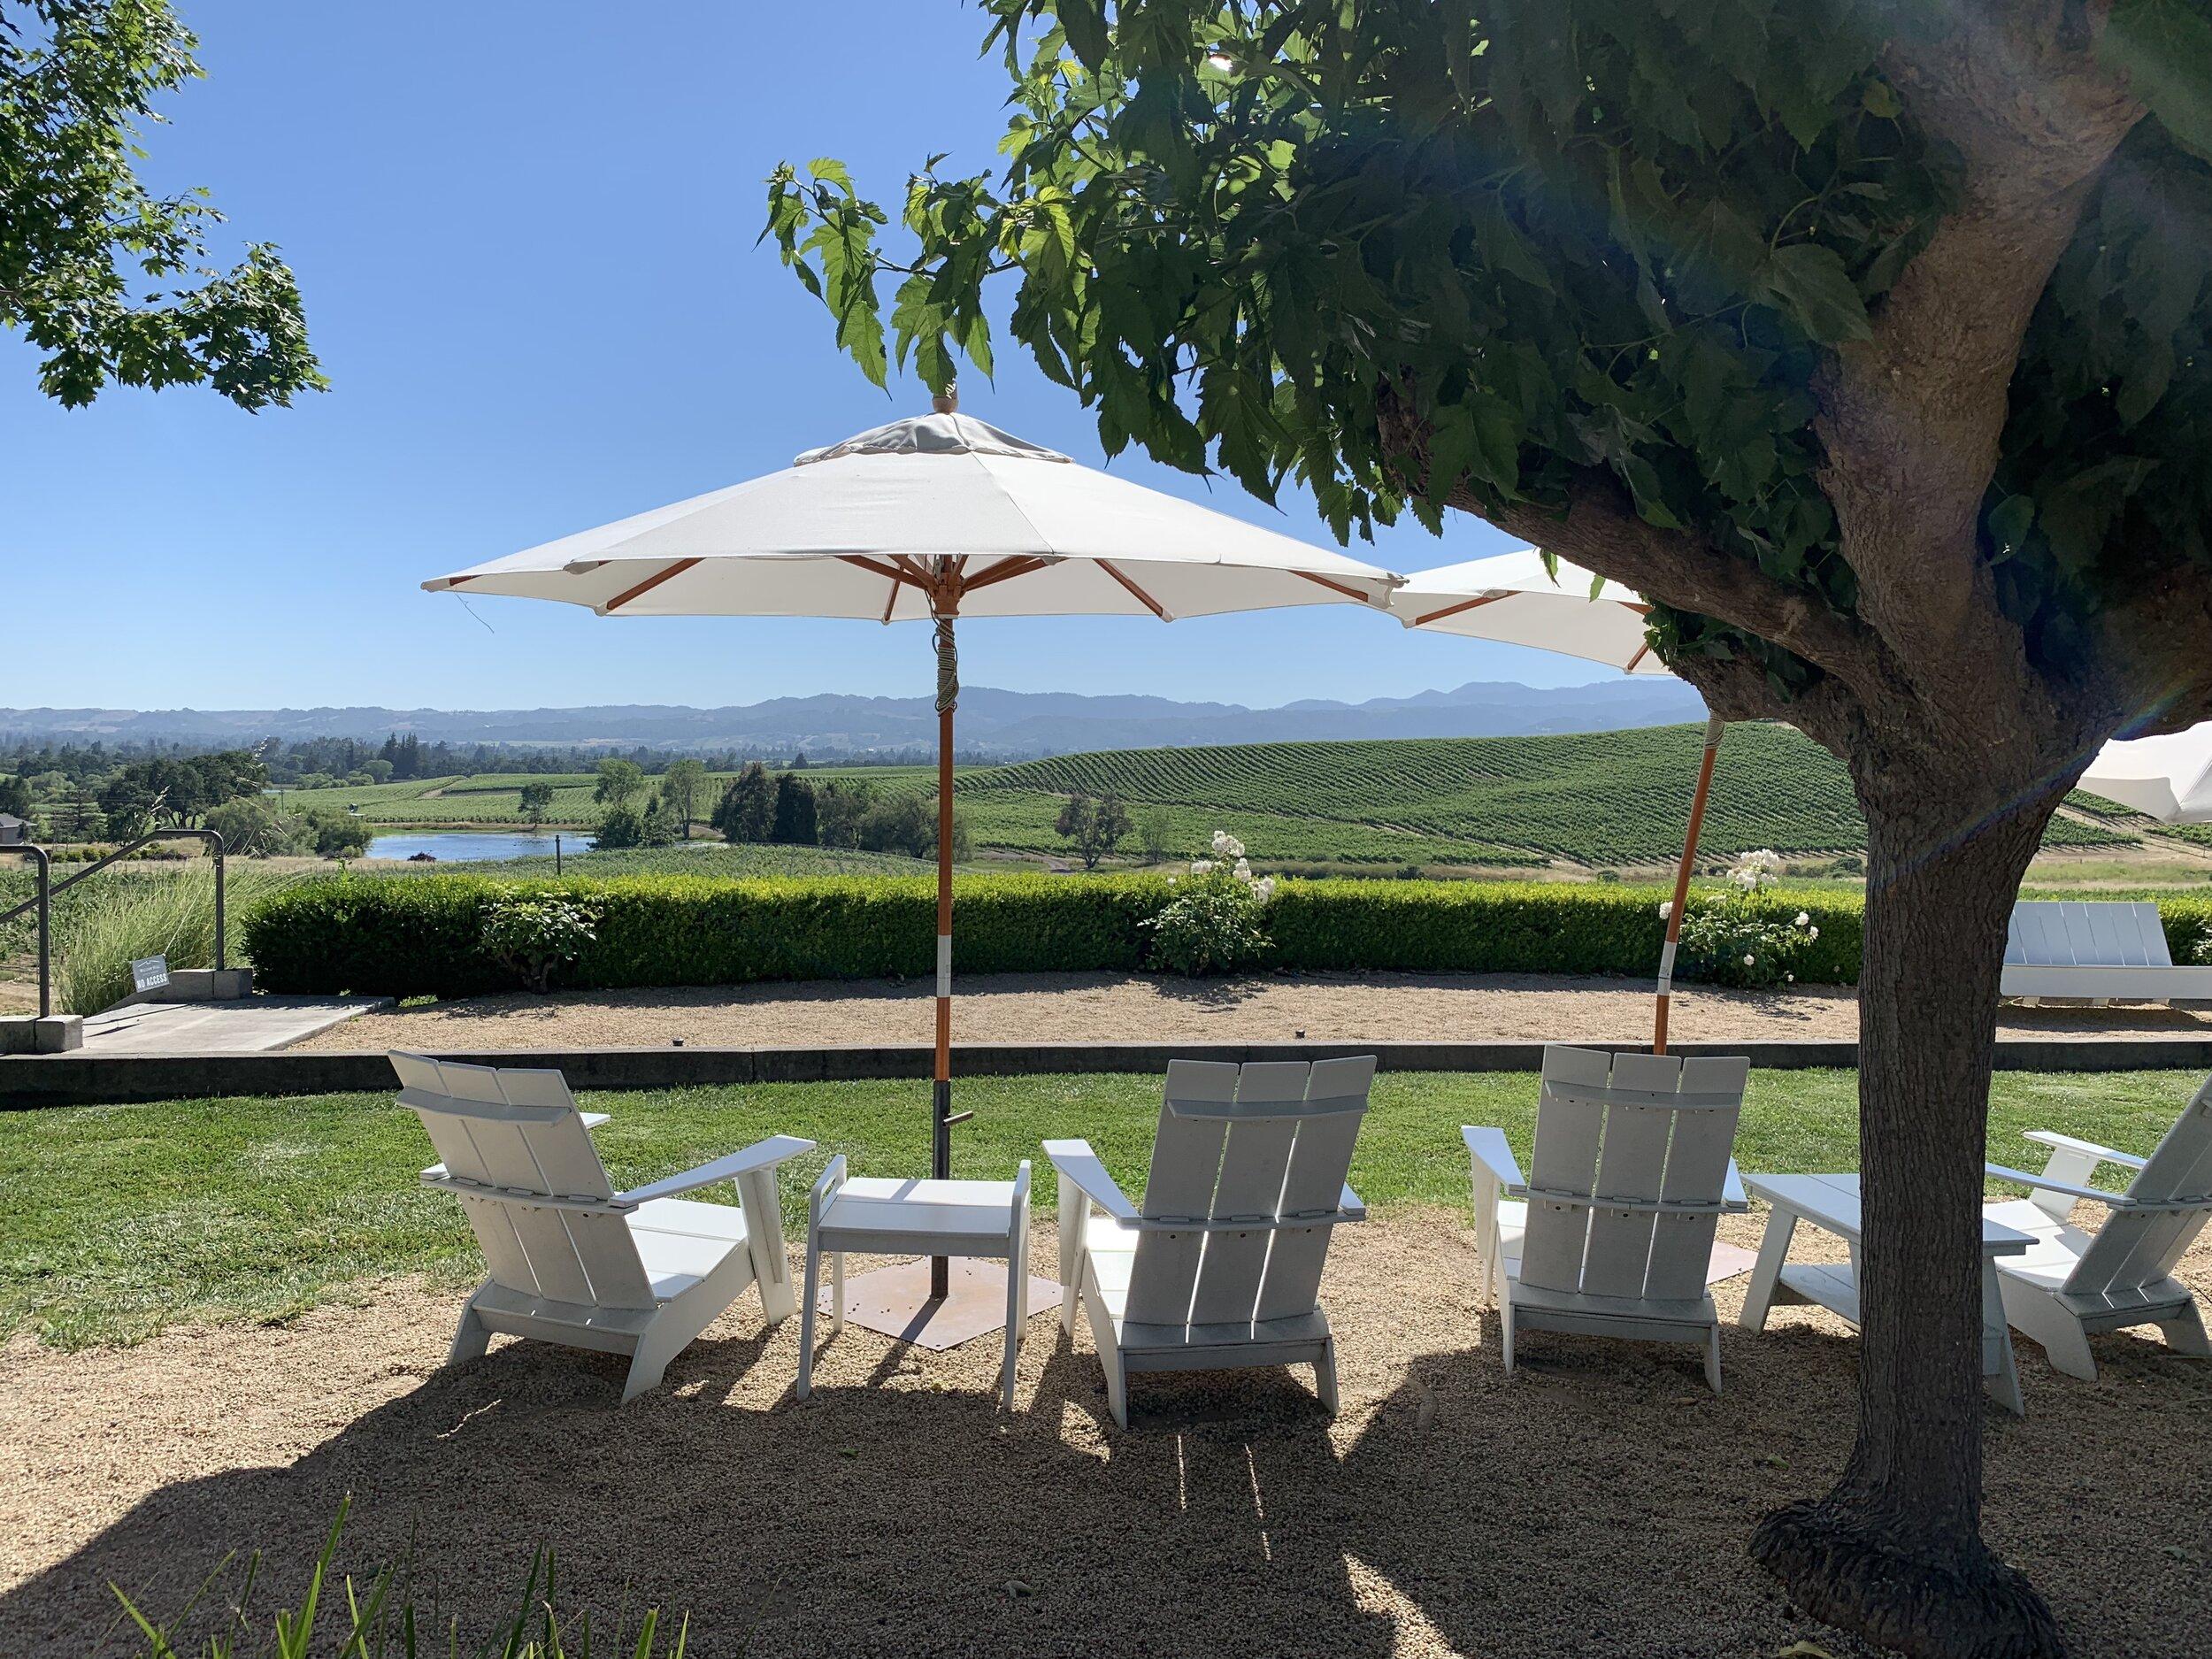 William Hill Estate Winery in Napa Valley